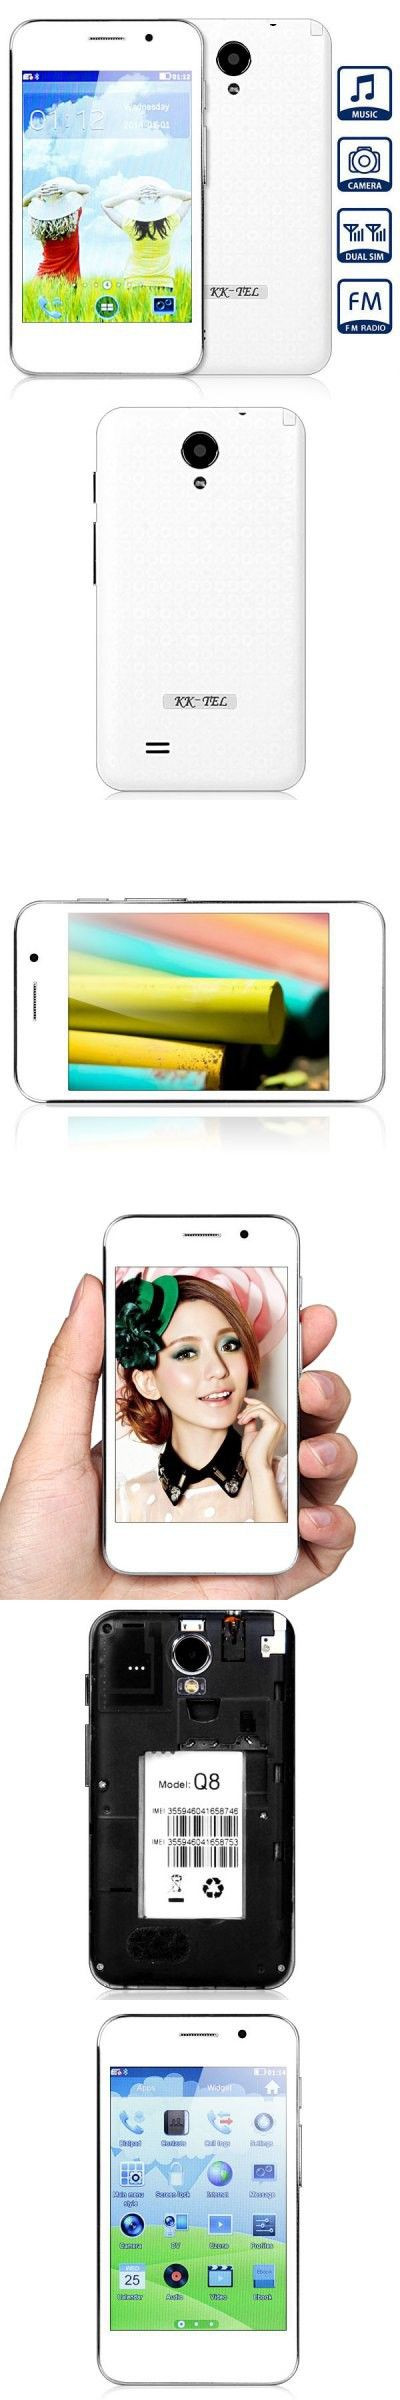 Q8 Dual Band Phone Dual SIM Camera 4.0 inch Capacitive Touch Screen Bluetooth